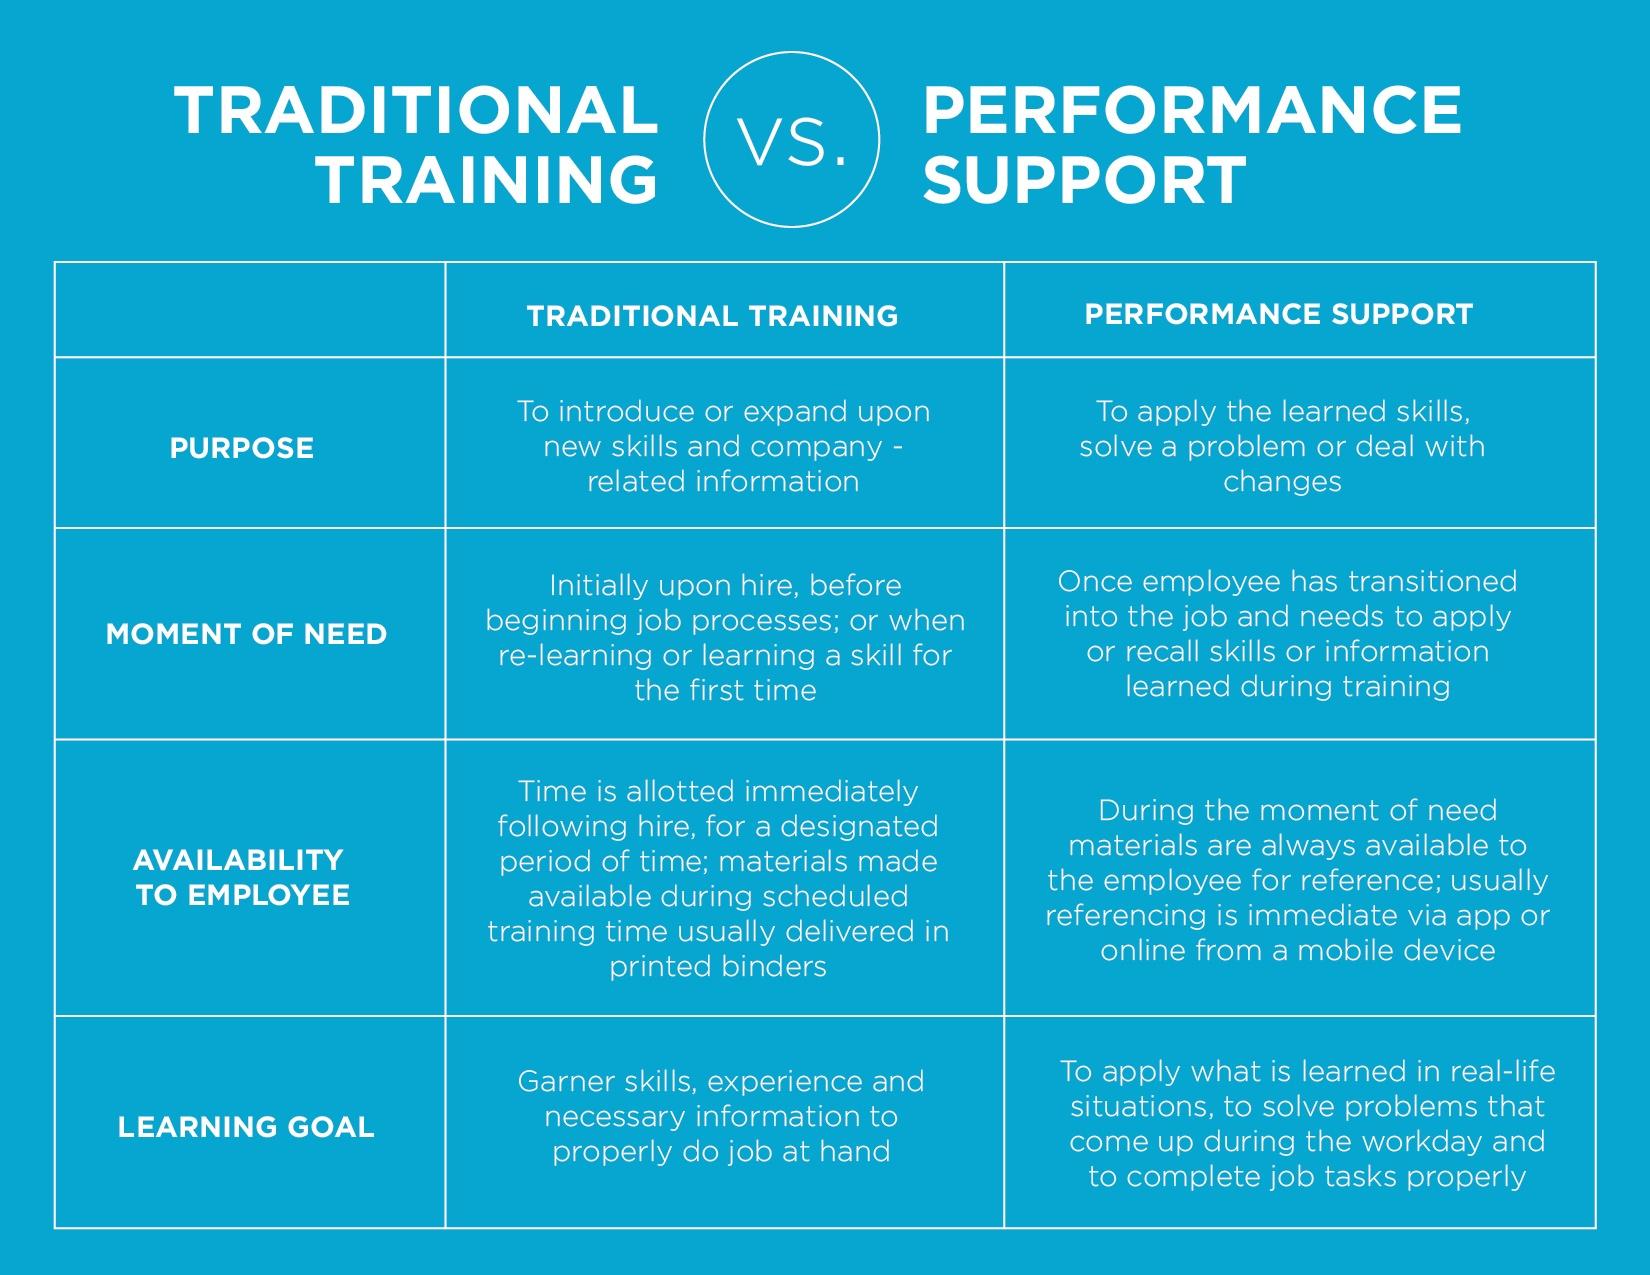 Training versus Performance Support